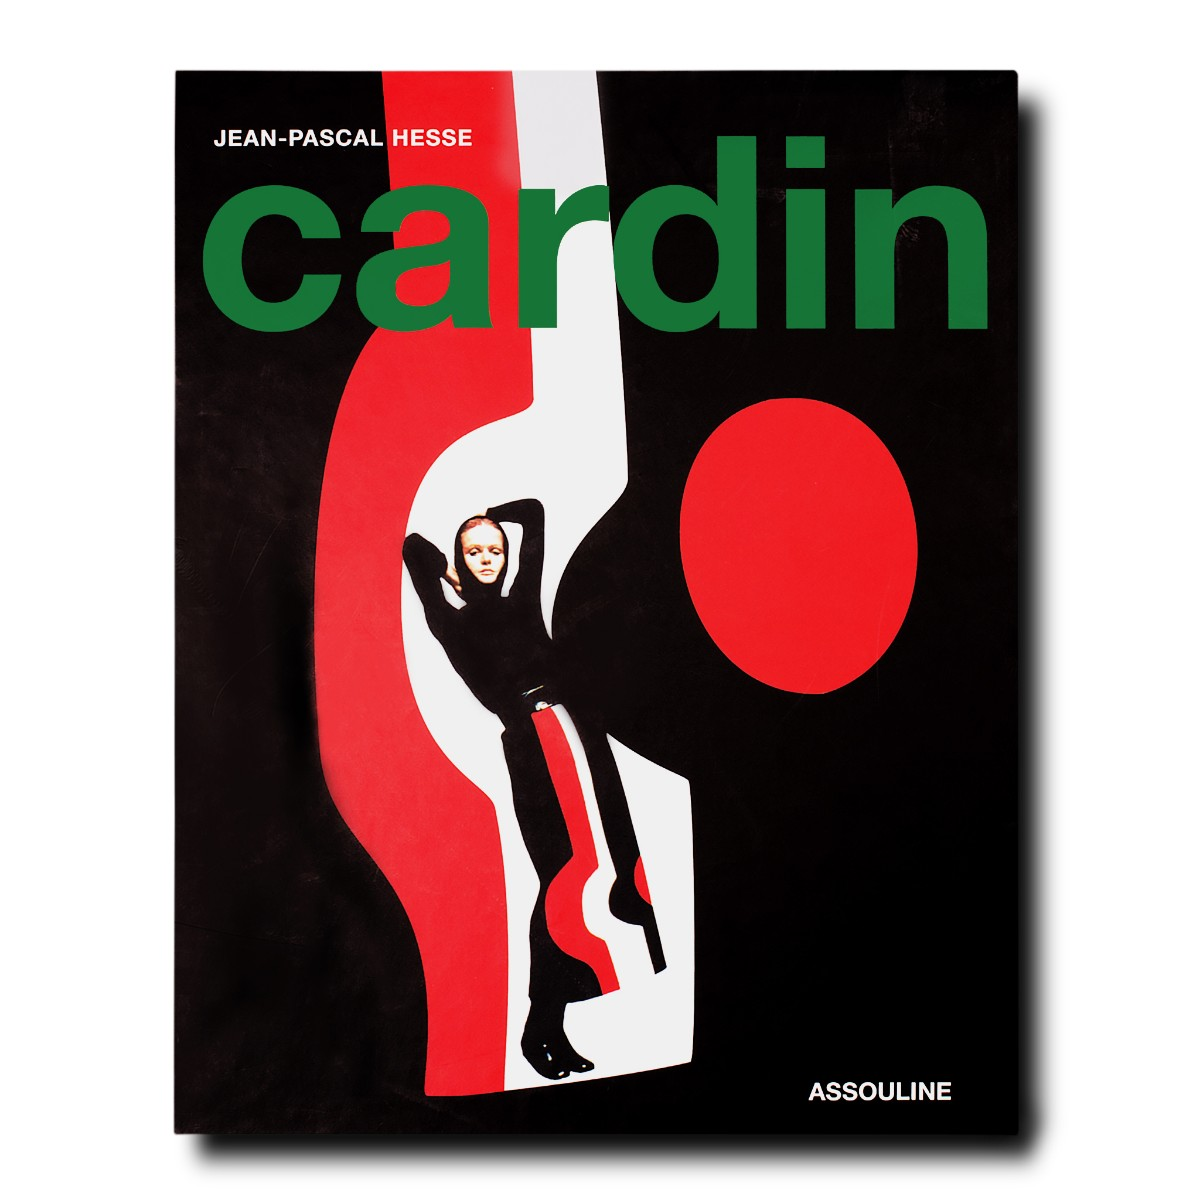 Assouline I Pierre Cardin